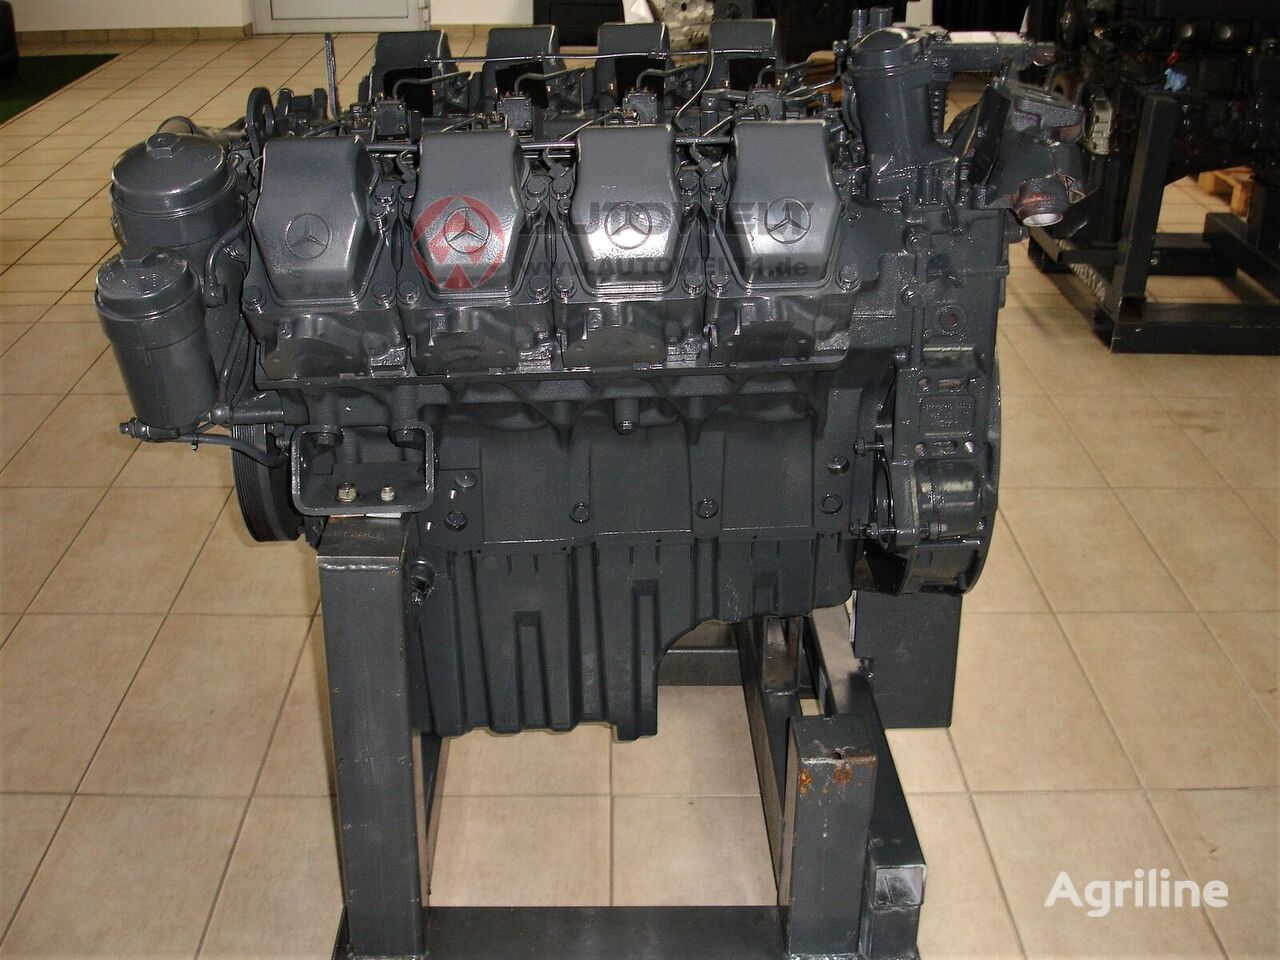 new MERCEDES-BENZ OM 502 LA engine for CLAAS Jaguar grain harvester